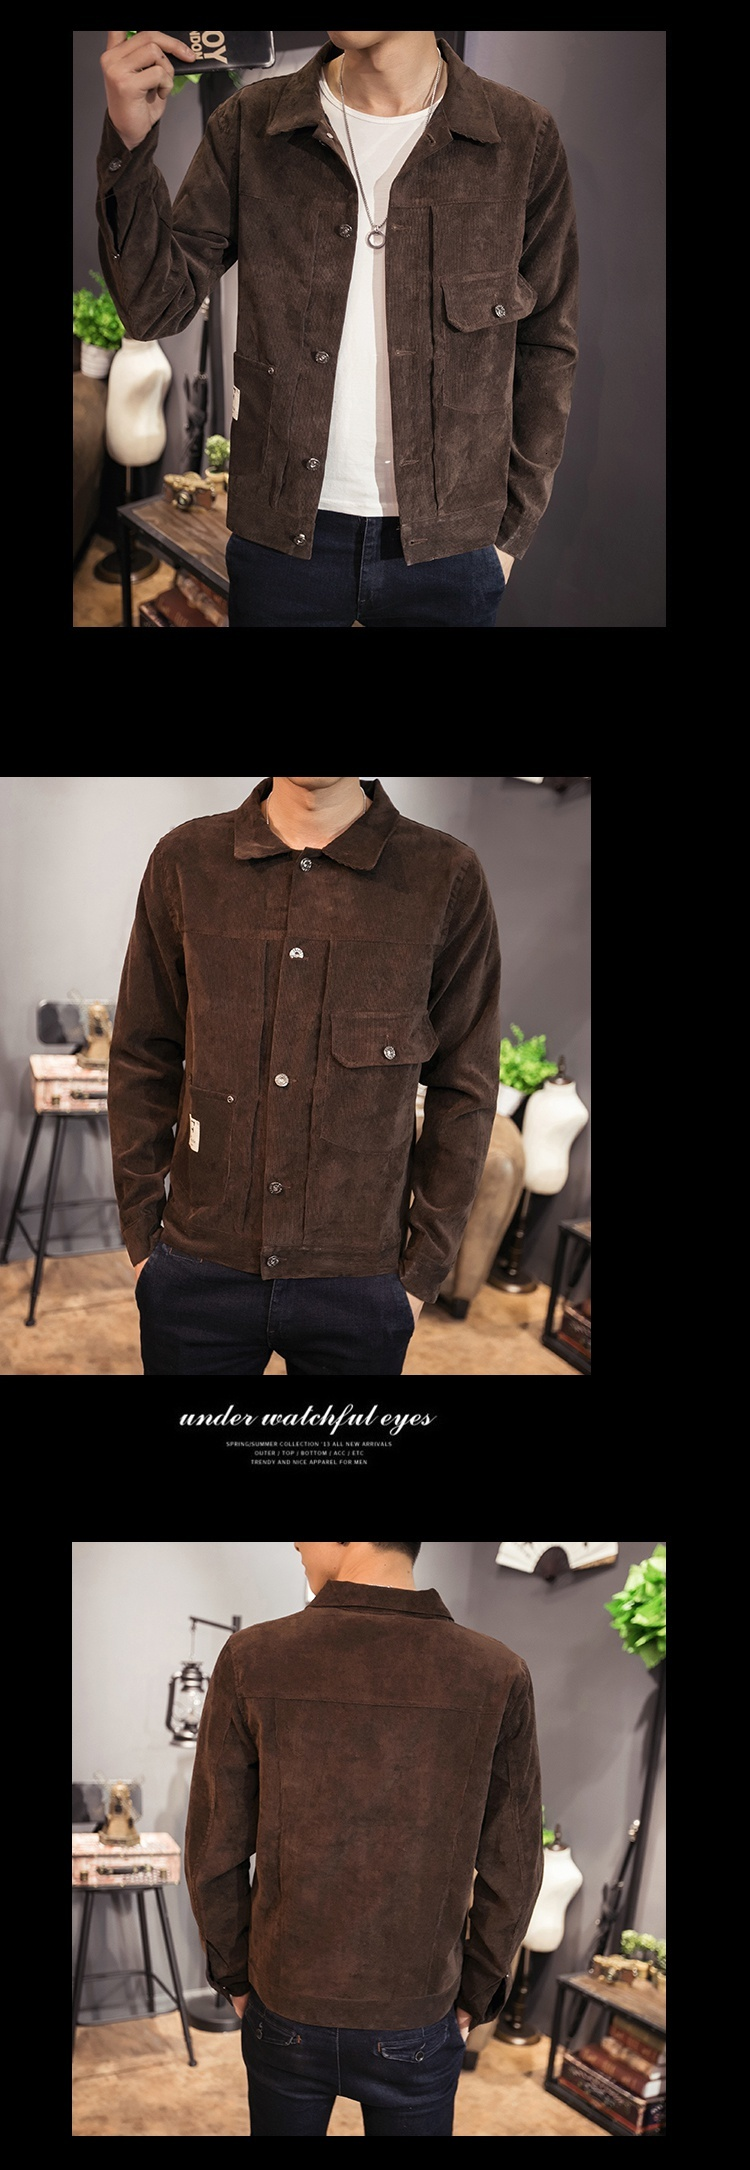 Hb859b69c1ed14f2e9f9ea7ed0e3e5ca6m Zongke Japan Style Corduroy Jacket Men Hip Hop Streetwear Men Jacket Coat Windbreaker Clothes Bomber Jacket Men 5XL 2019 New